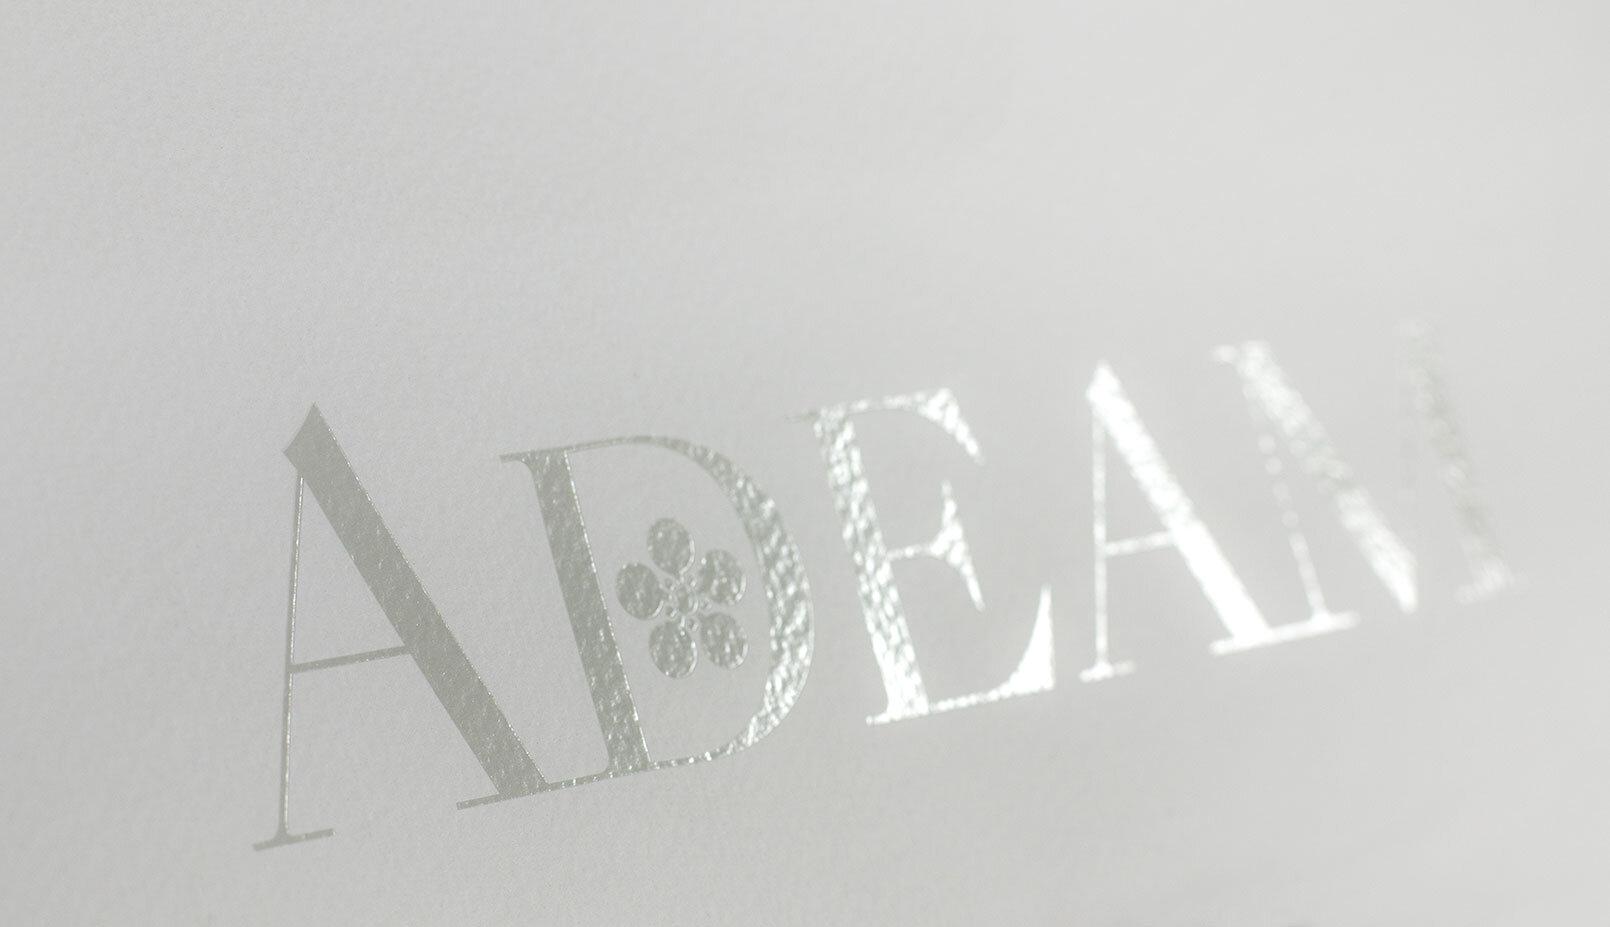 Adeam-Shopping-Bag-Design-Packaging-Company-3.JPG